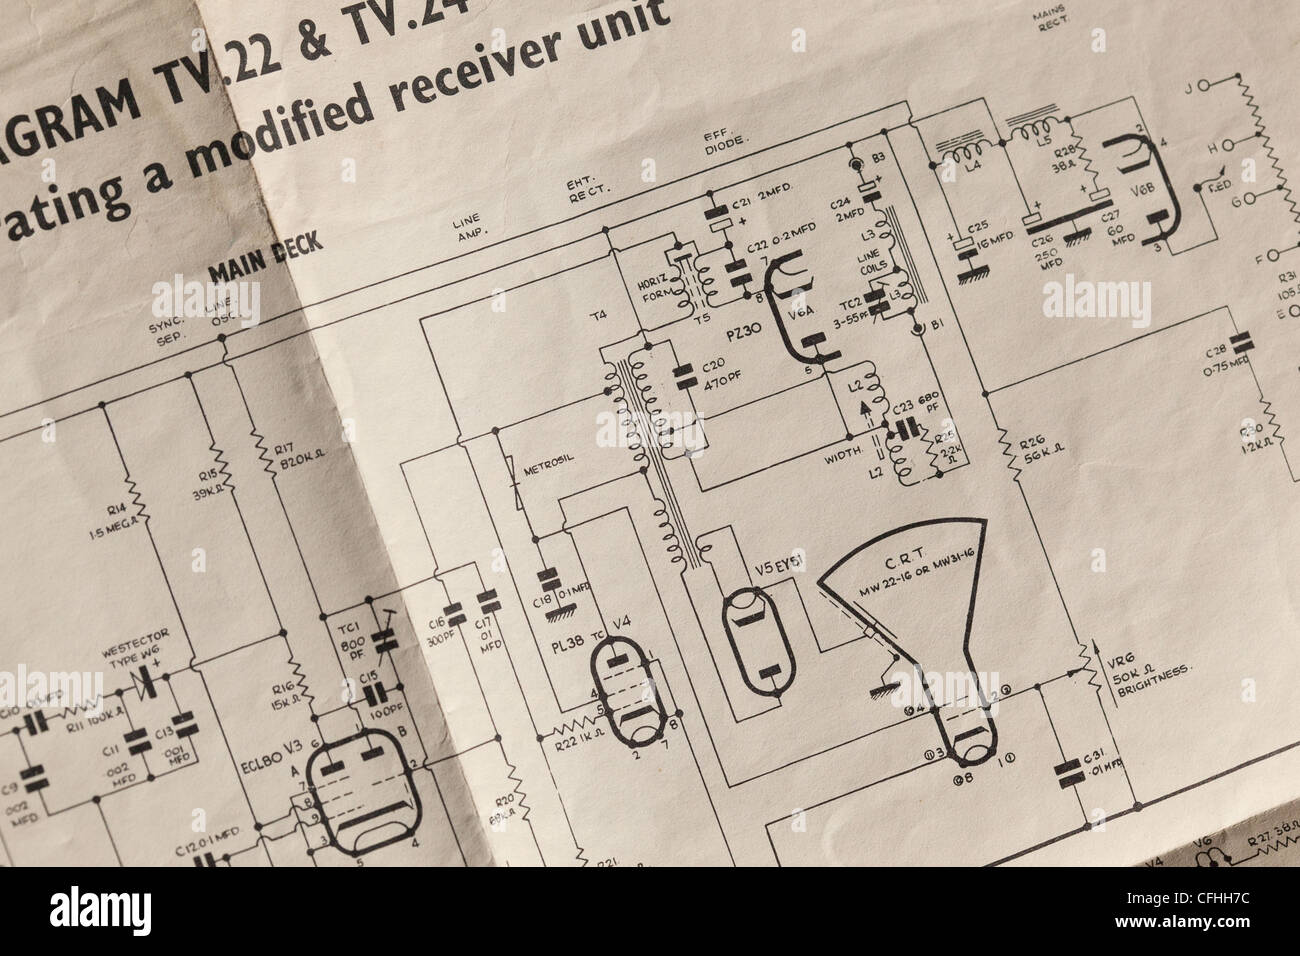 Bush tv22 from 1950 classic bakelite tv circuit diagramson sale as bush tv22 from 1950 classic bakelite tv circuit diagramson sale as auction lot montrose scotland ccuart Images